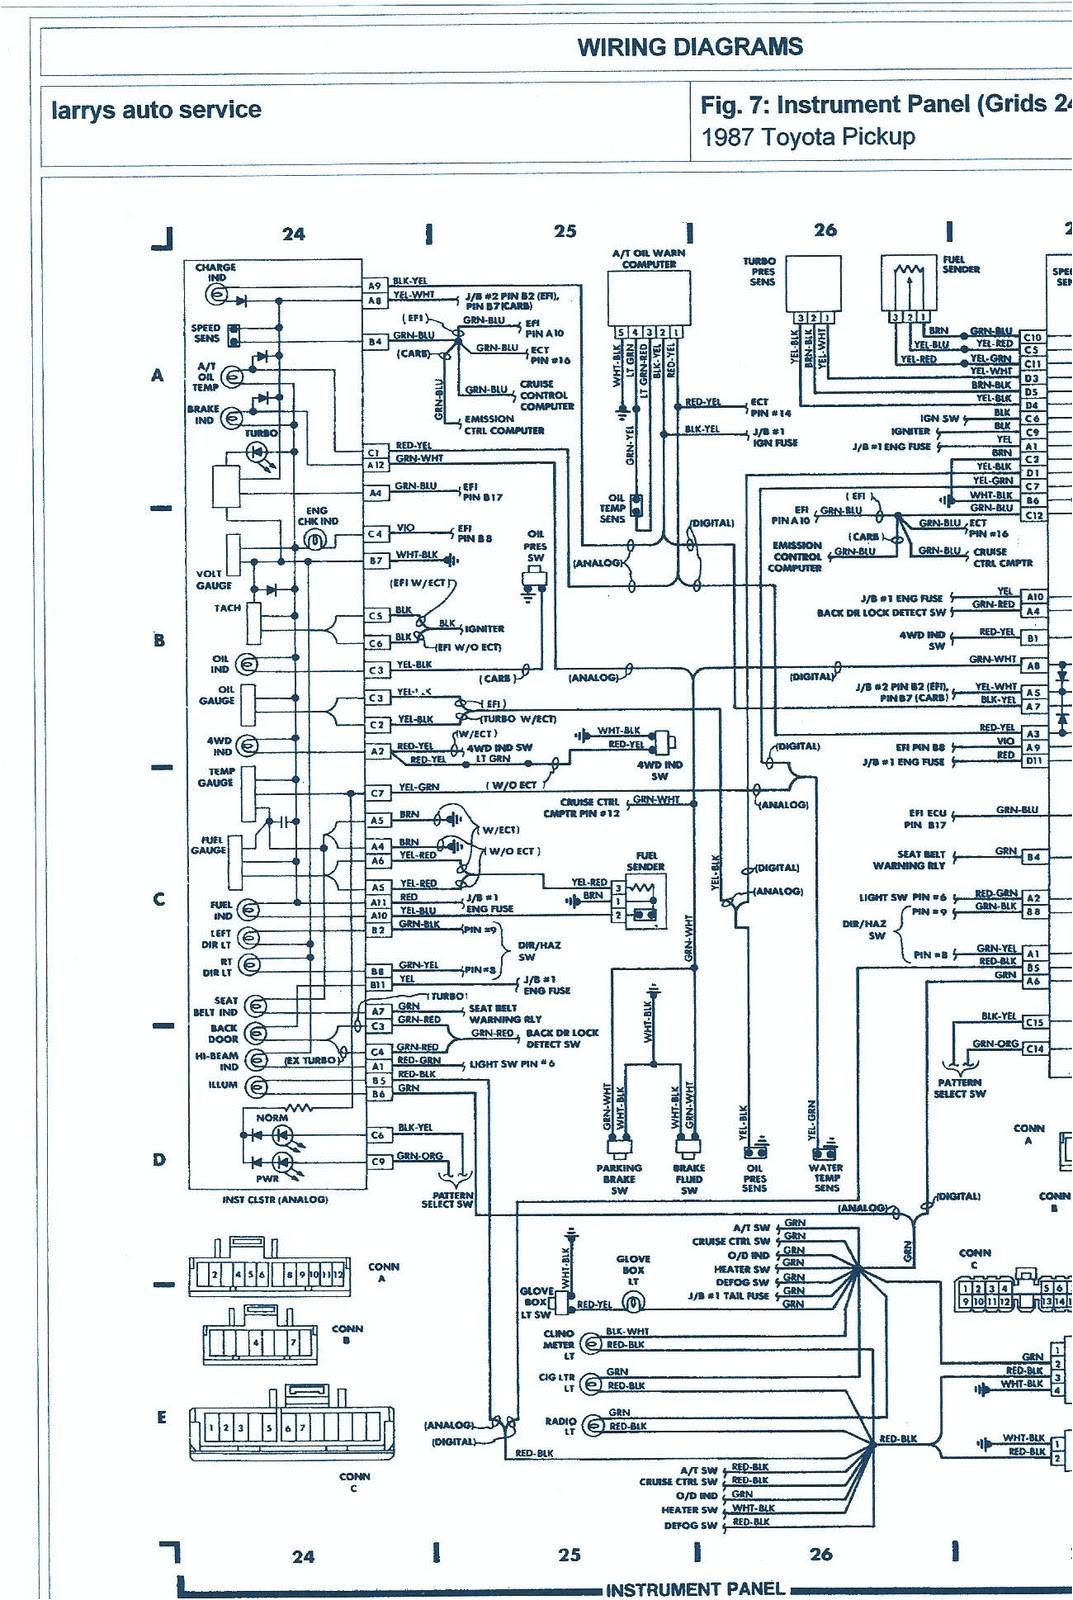 trailer wiring toyota cressida 1985 wiring diagram blog toyota cressida wiring harness wiring diagram note trailer